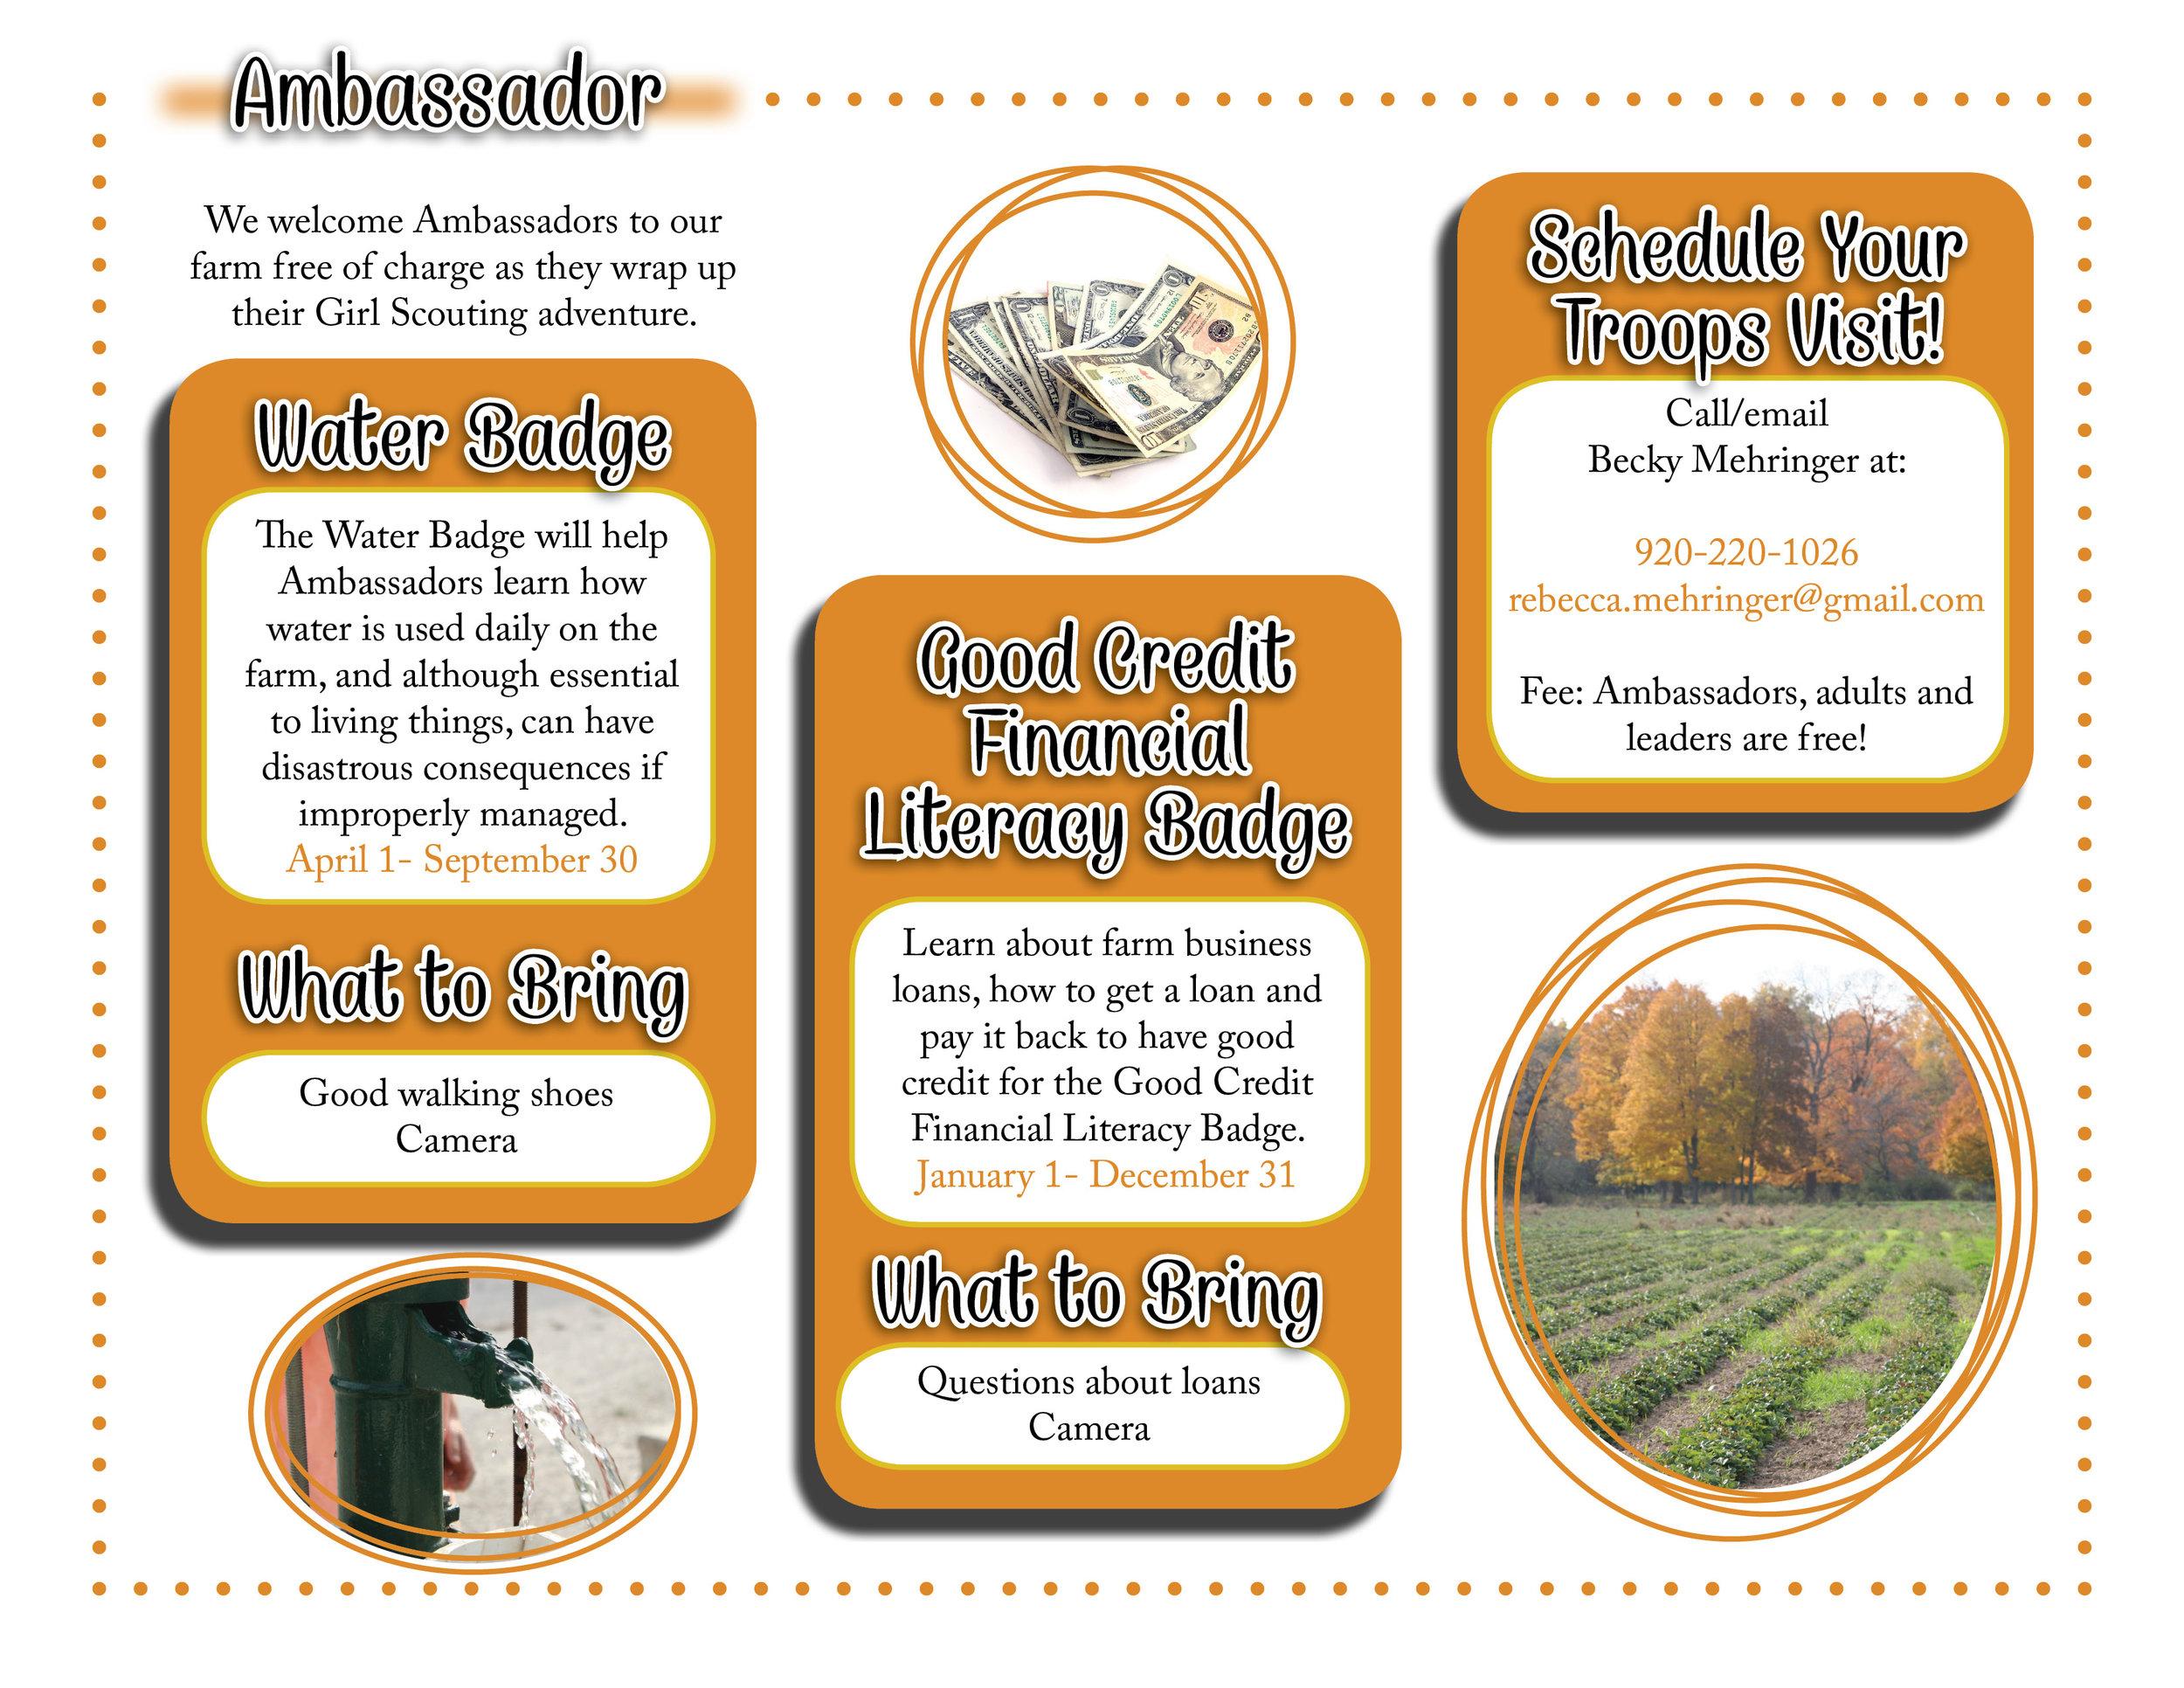 Ambassador website graphic.jpg